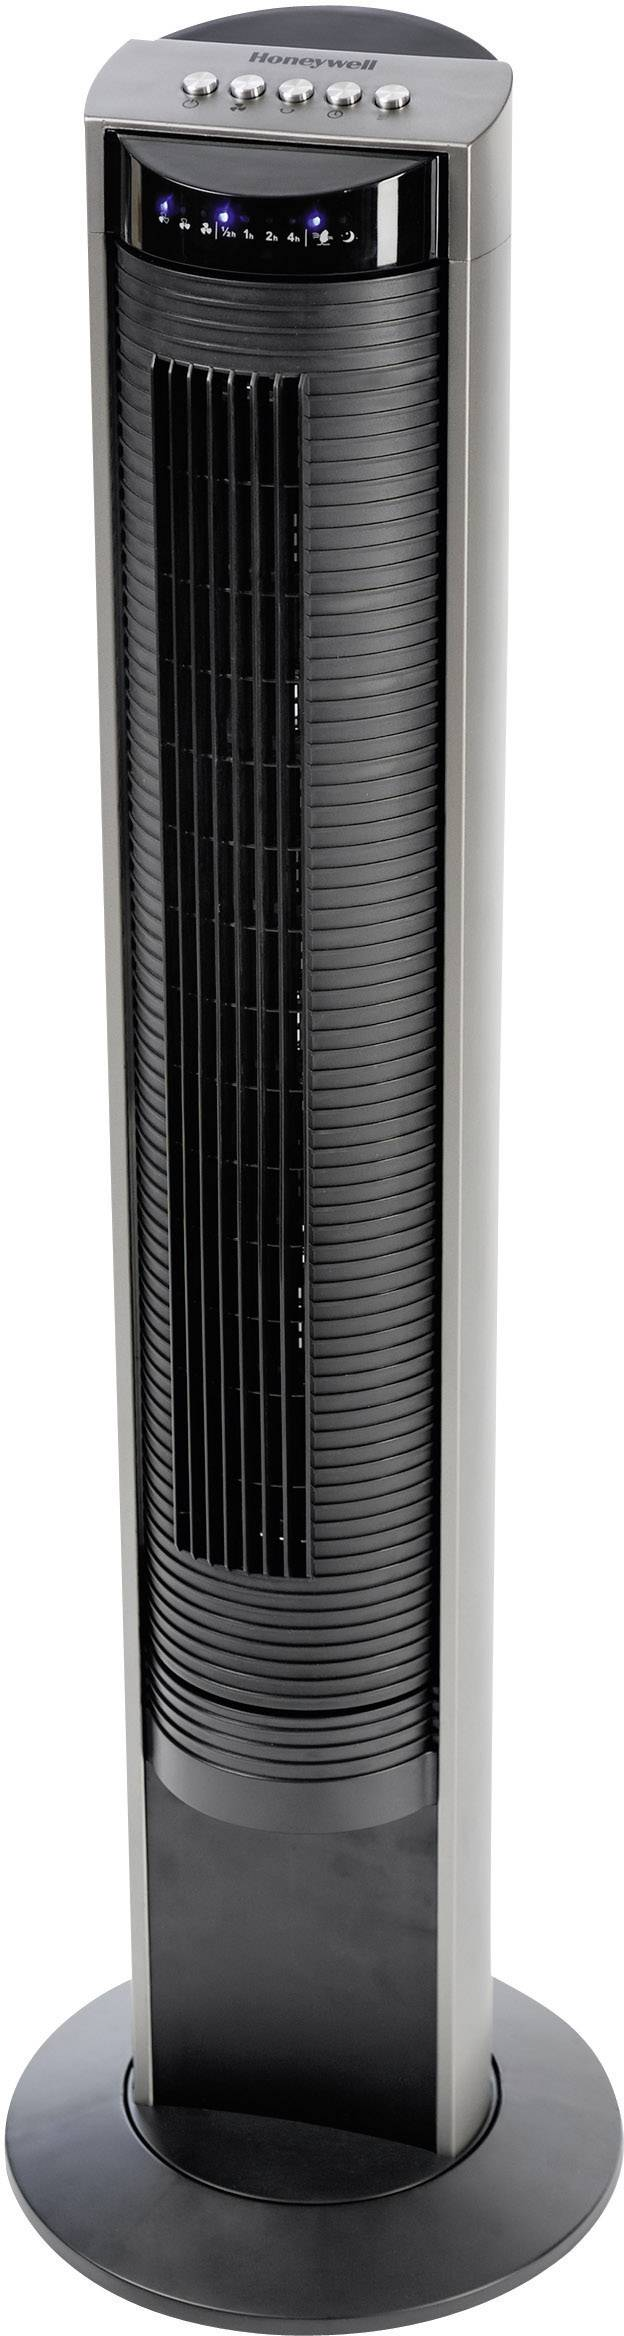 Conrad-Honeywell AIDC HO-5500RE Torenventilator 40 W (Ø x h) 30.5 cm x 103.5 cm Zwart, Grijs-aanbieding